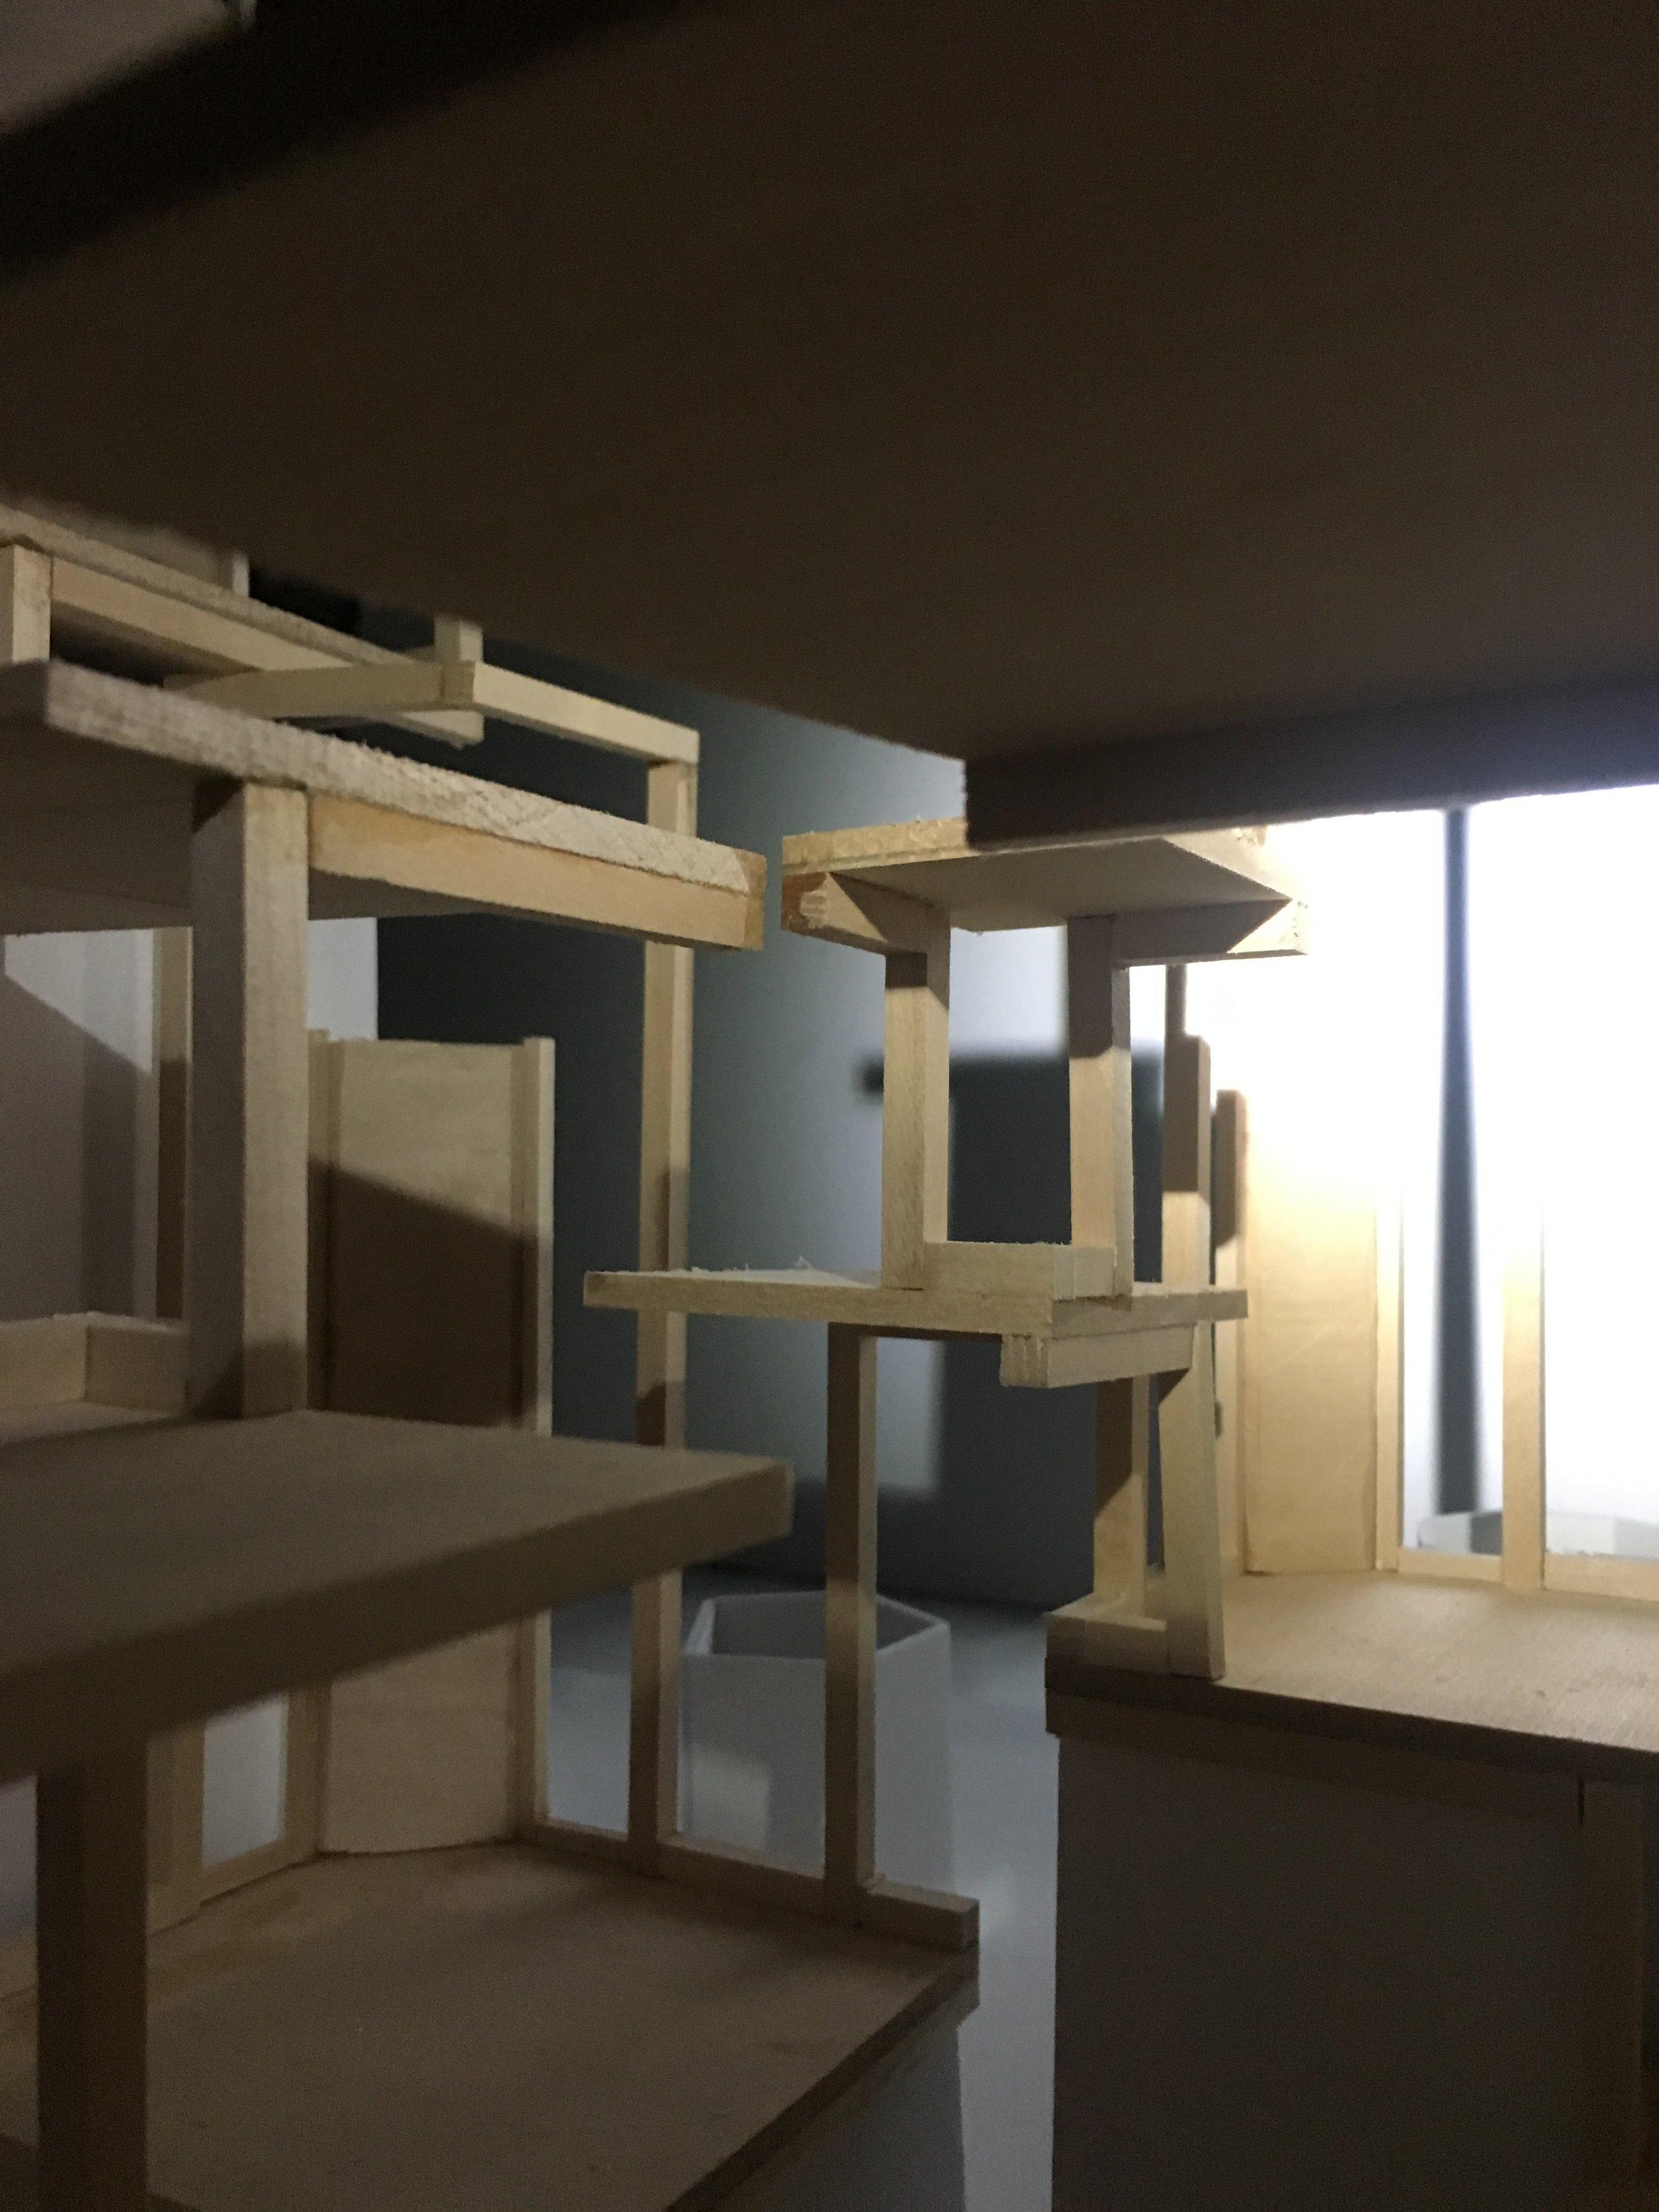 interior-study-3-min.jpg